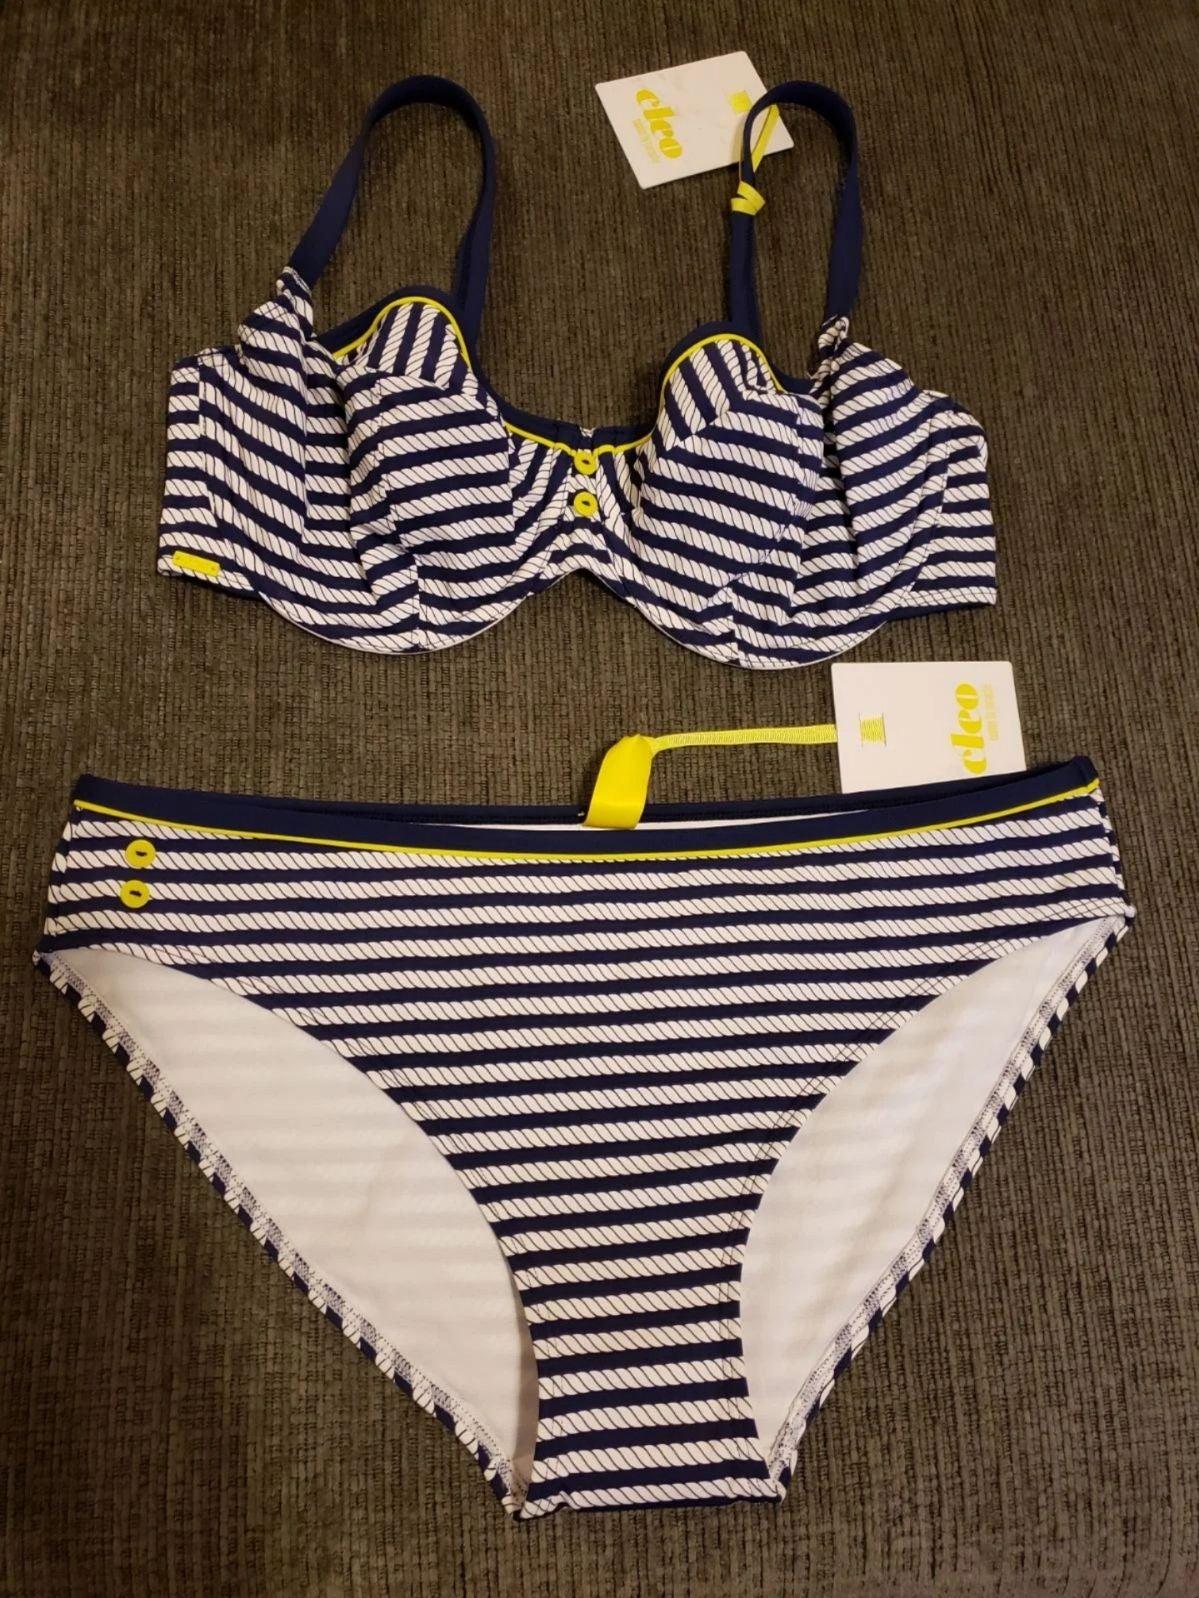 CLEO by PANACHE Bikini 36 E & Large NWT